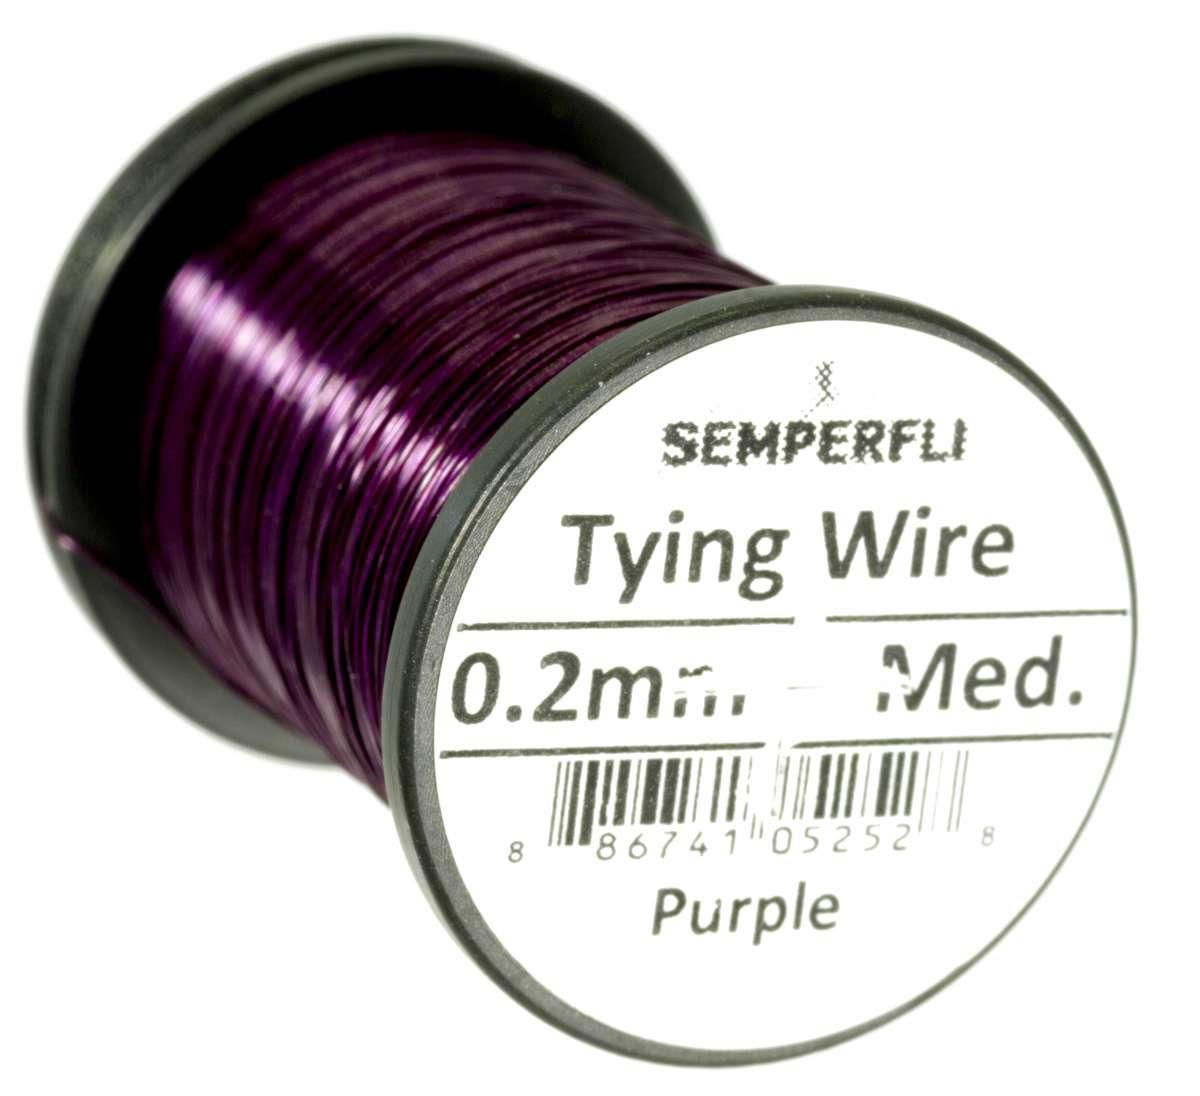 lurewire purple